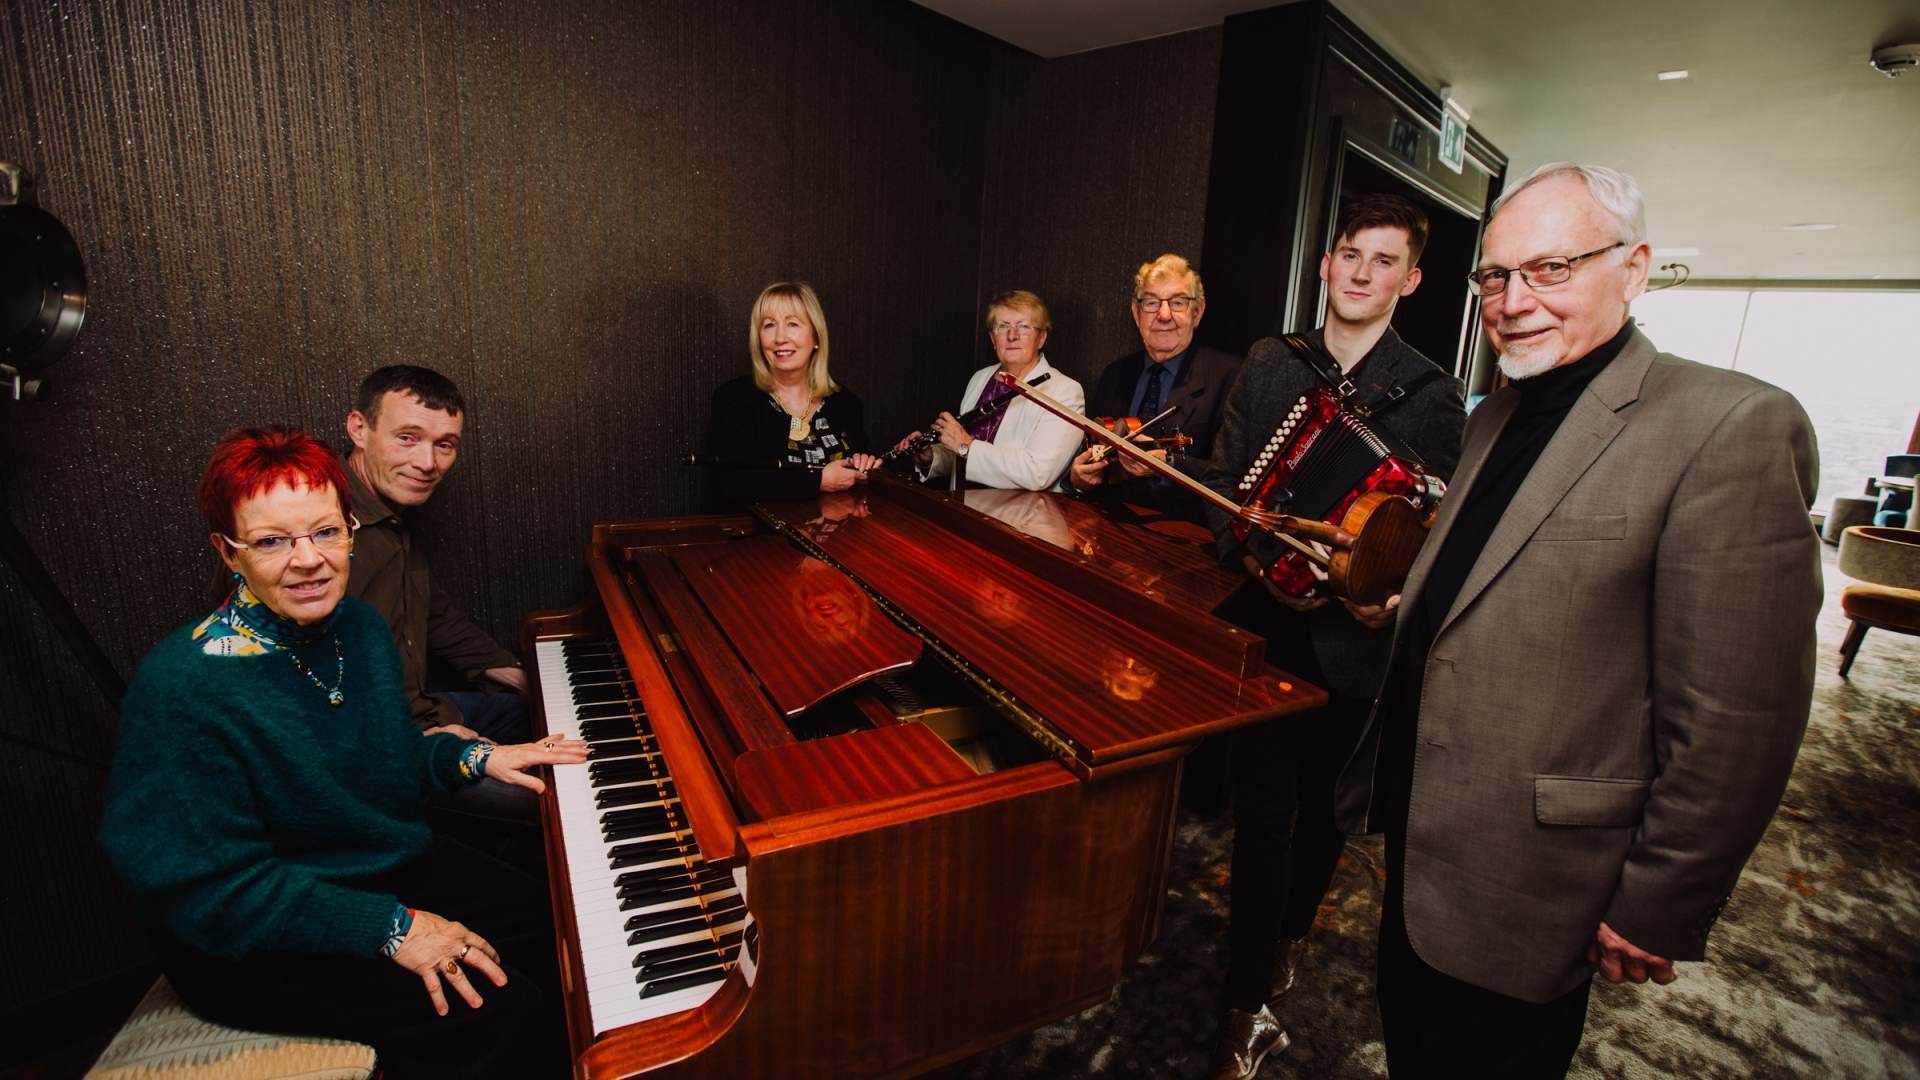 Gradam Ceoil TG4 2019   Irish Traditional Music Awards   TG4